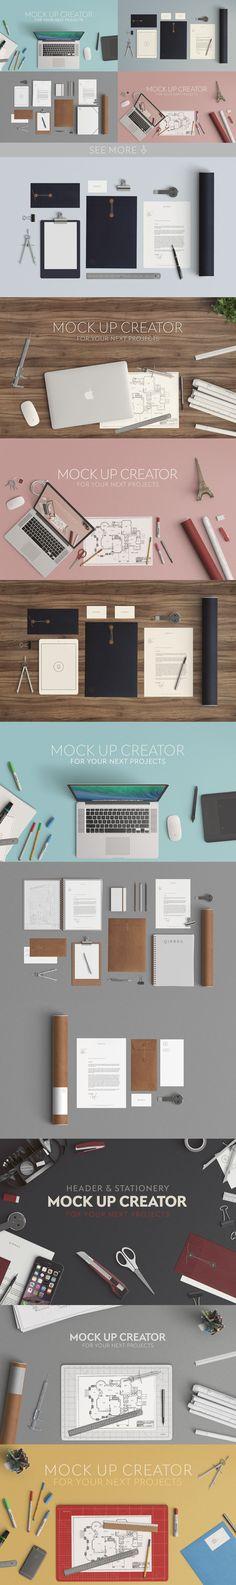 Header & Stationery Mock Up Creator - Product Mockups - 3